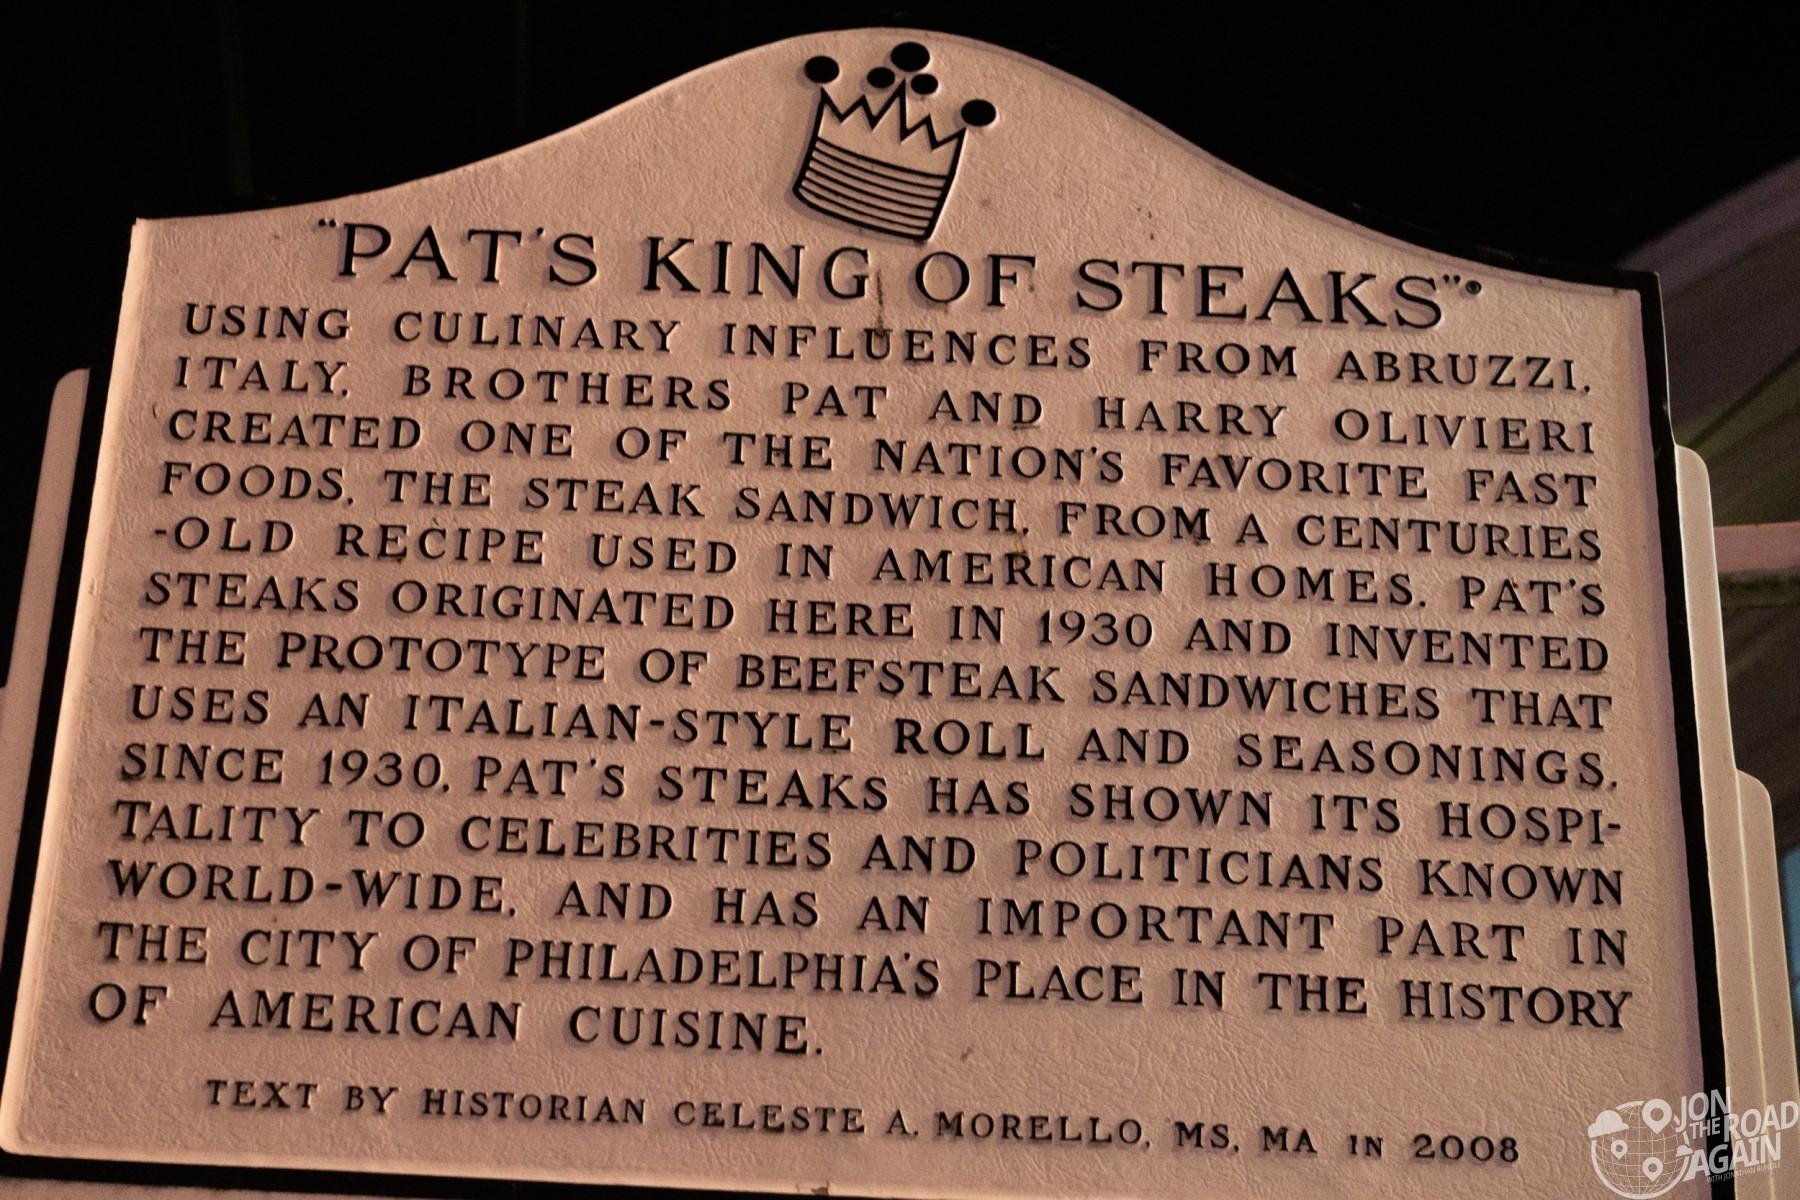 Pat's King of Steaks Historic Marker